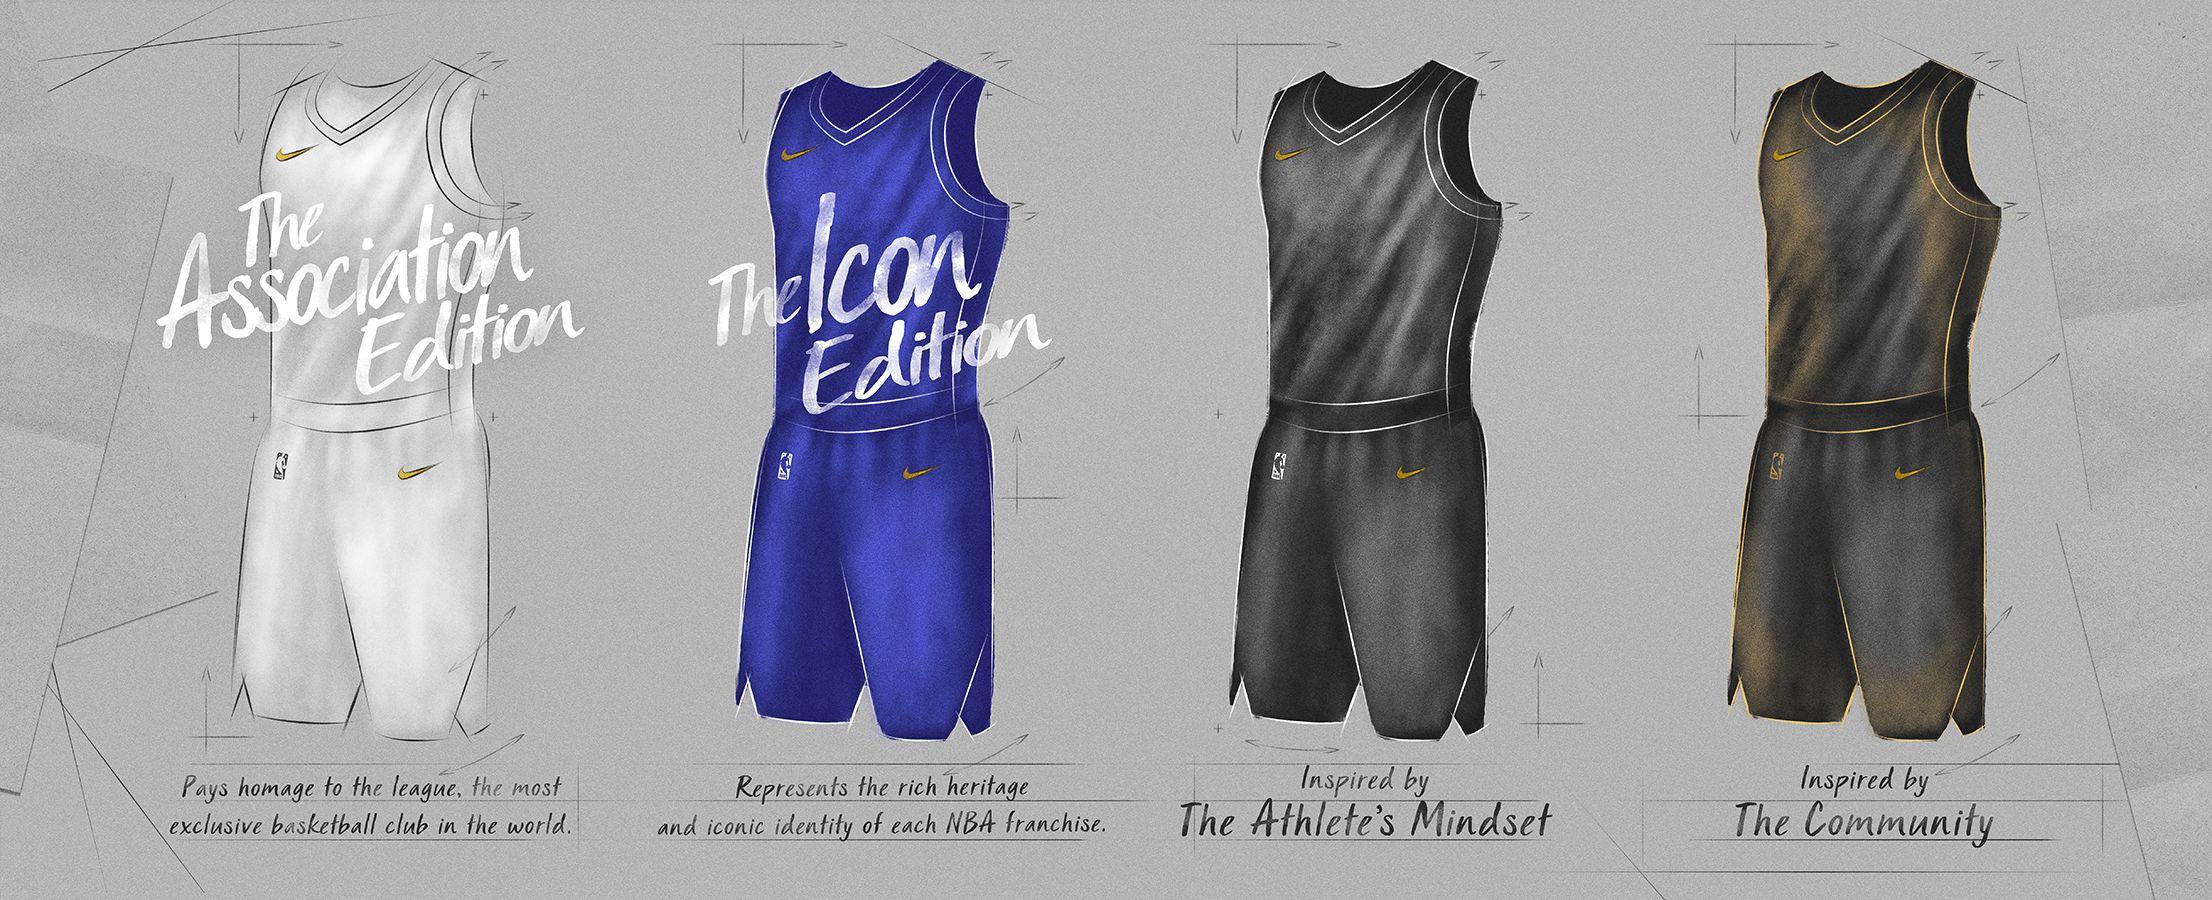 nike-basketball-nba-uniforms_original.jpg